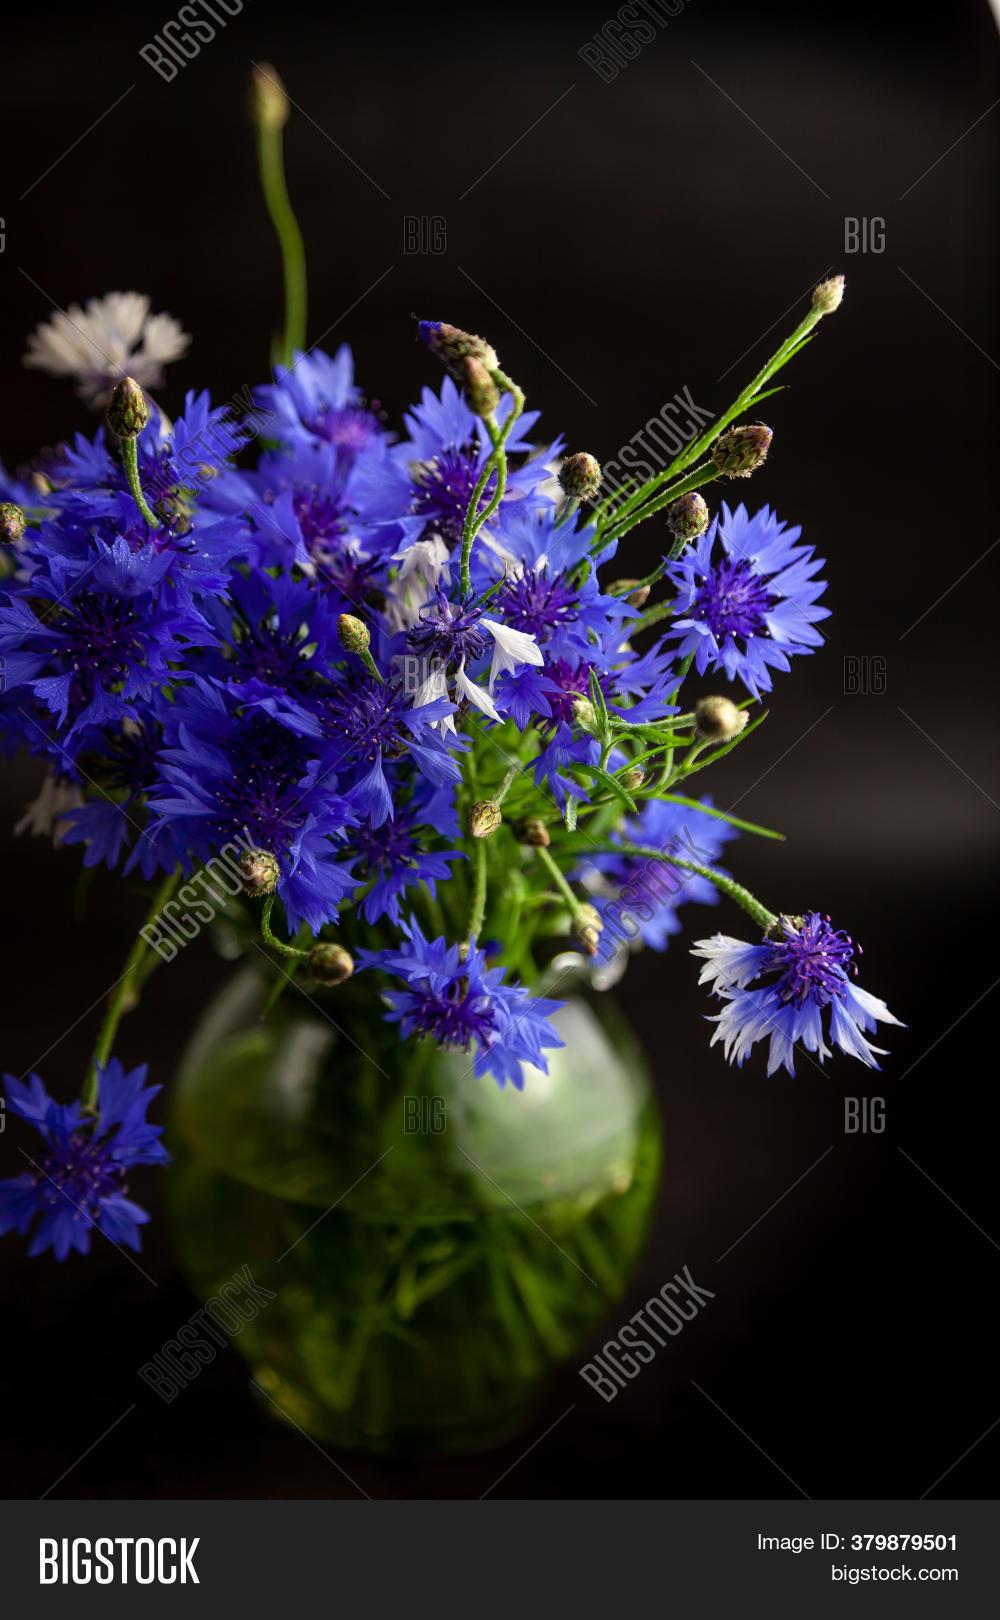 Cornflower Flower Image Photo Free Trial Bigstock